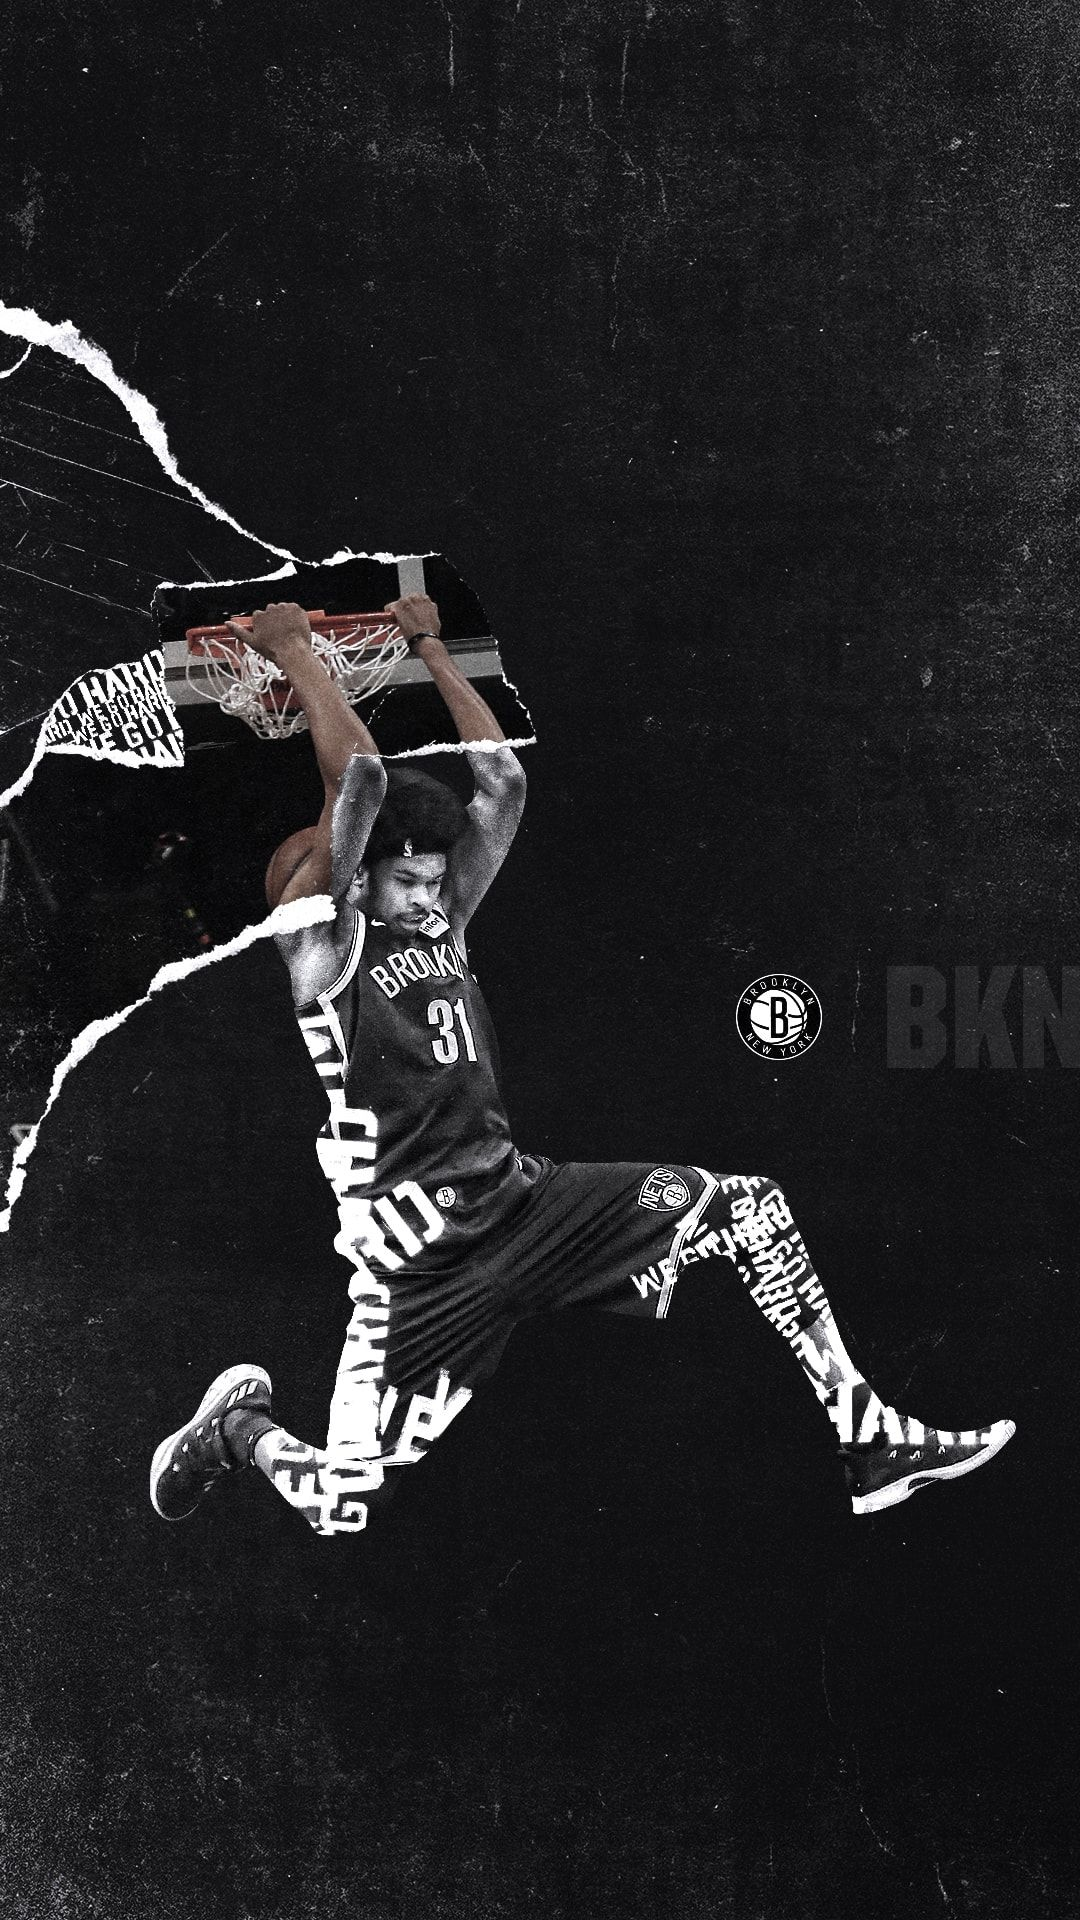 Iphone Wallpaper Hd Brooklyn Nets 2021 Basketball Wallpaper Brooklyn Nets Basketball Wallpaper Basketball Wallpapers Hd Abstract basketball iphone wallpaper